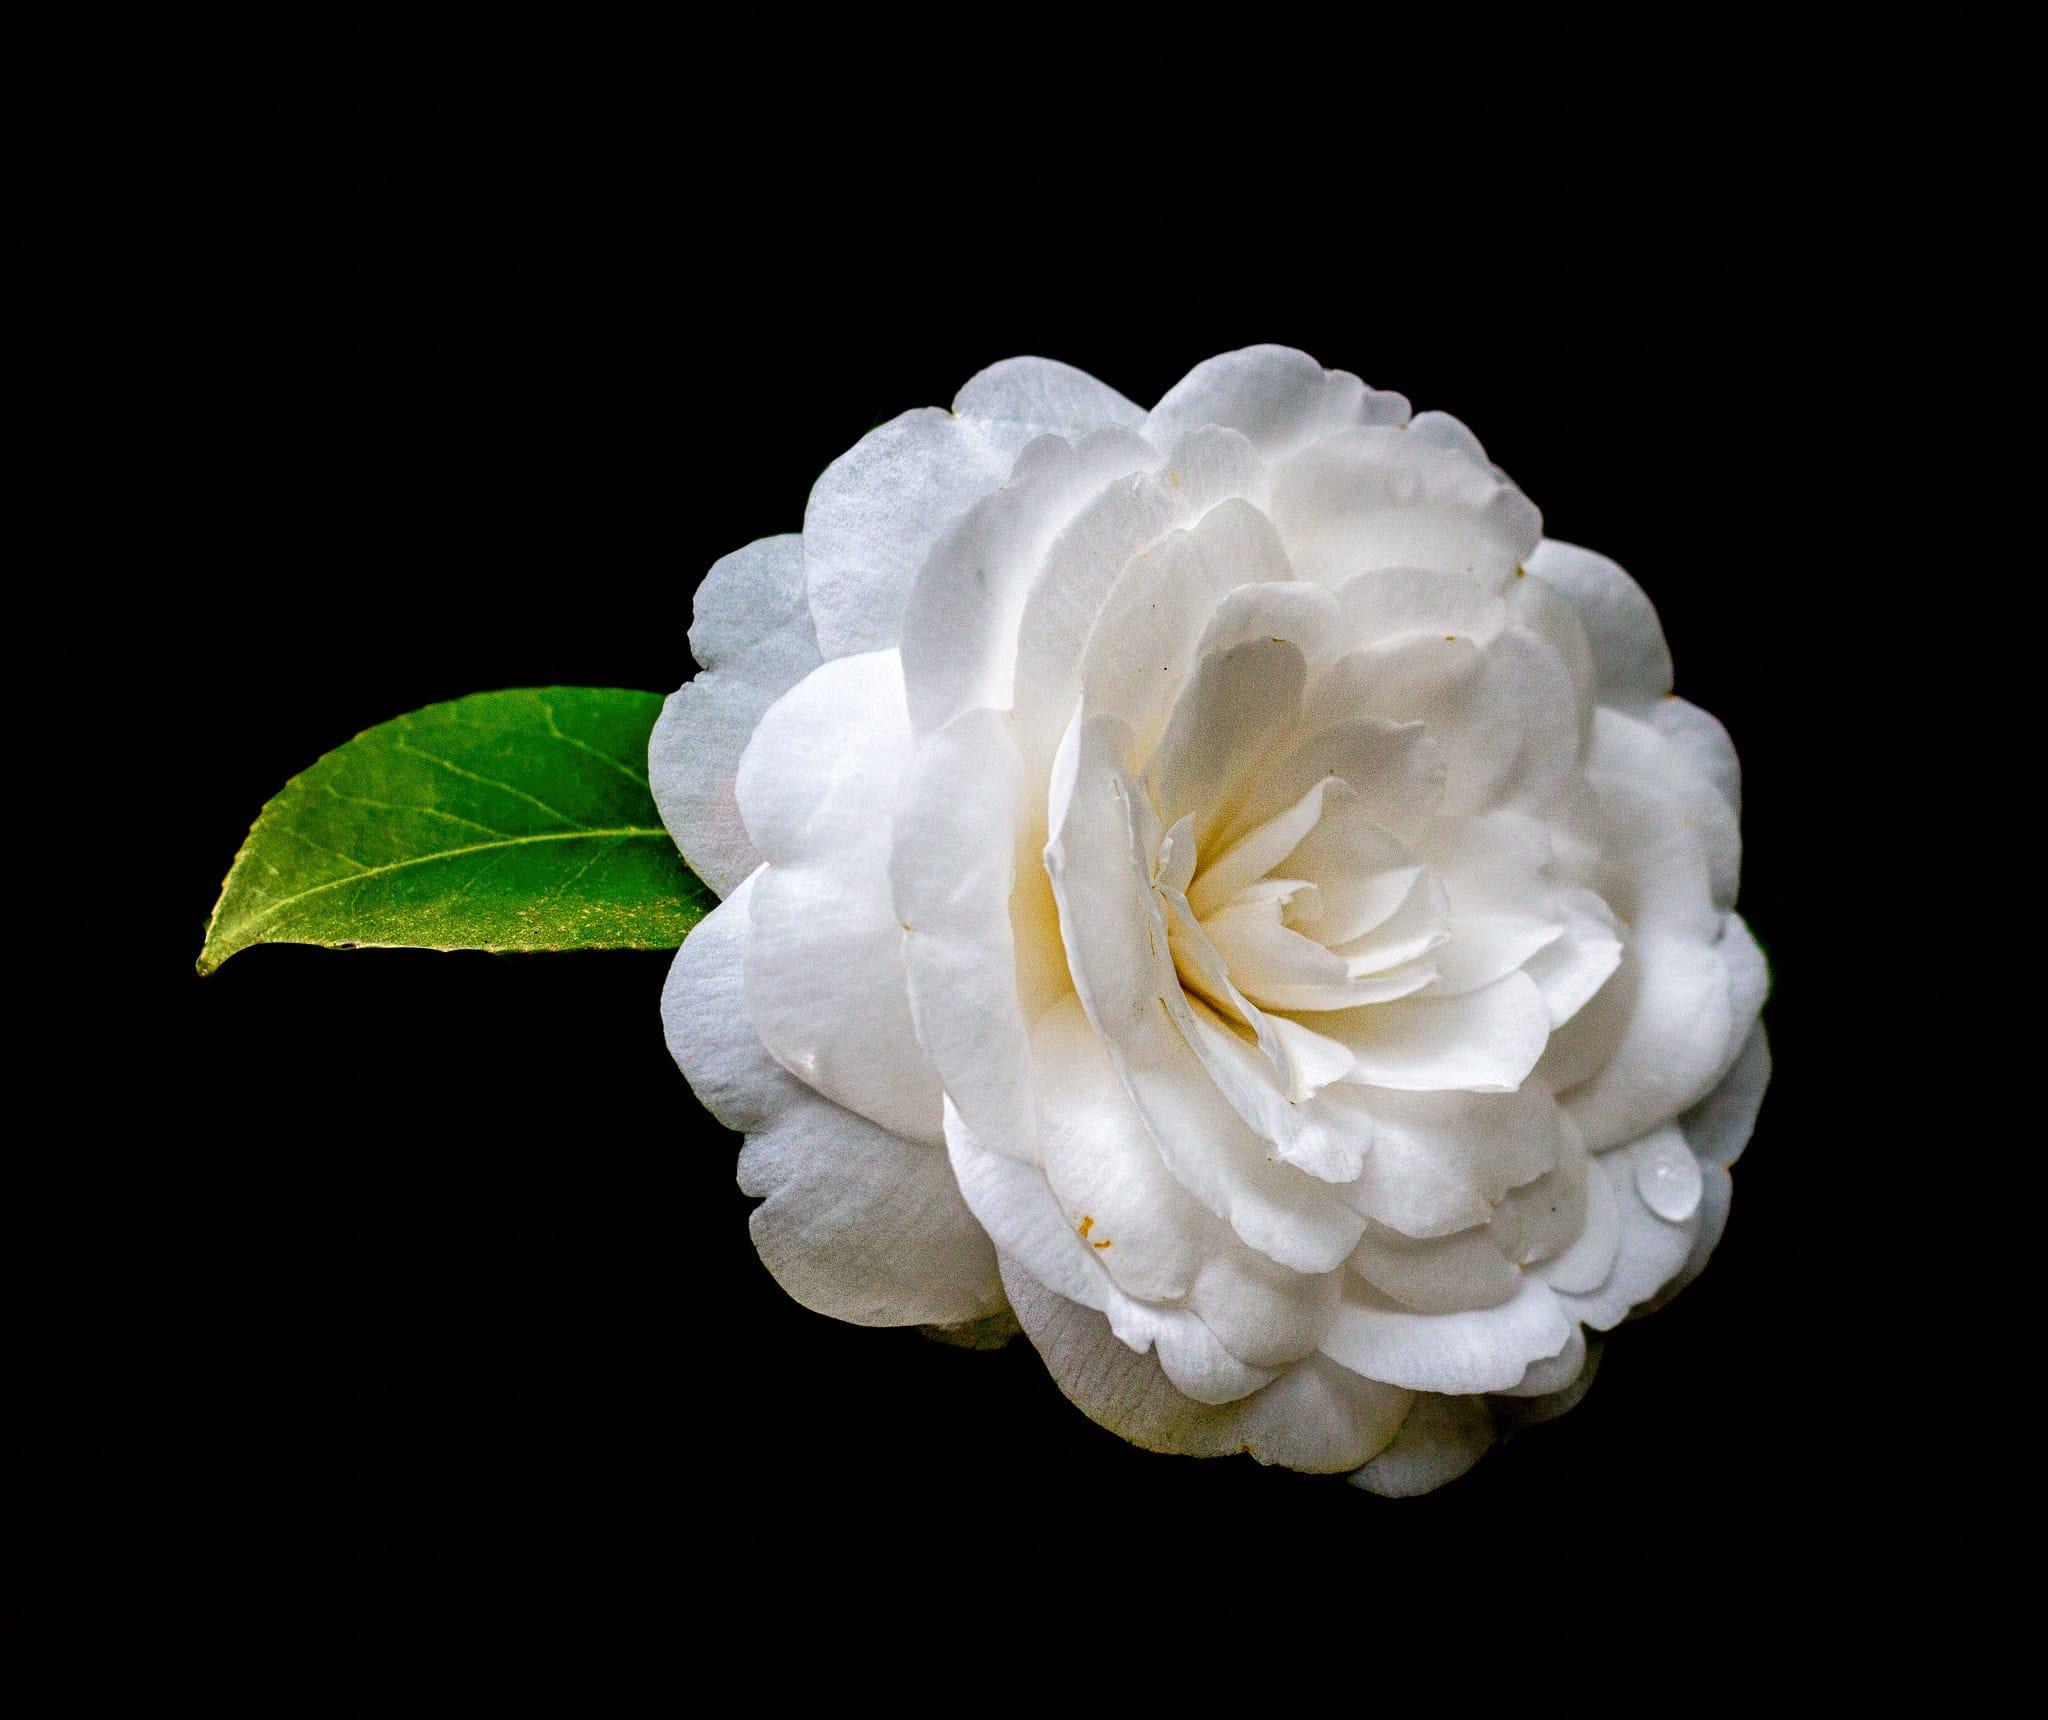 Vista de la Camellia japonica